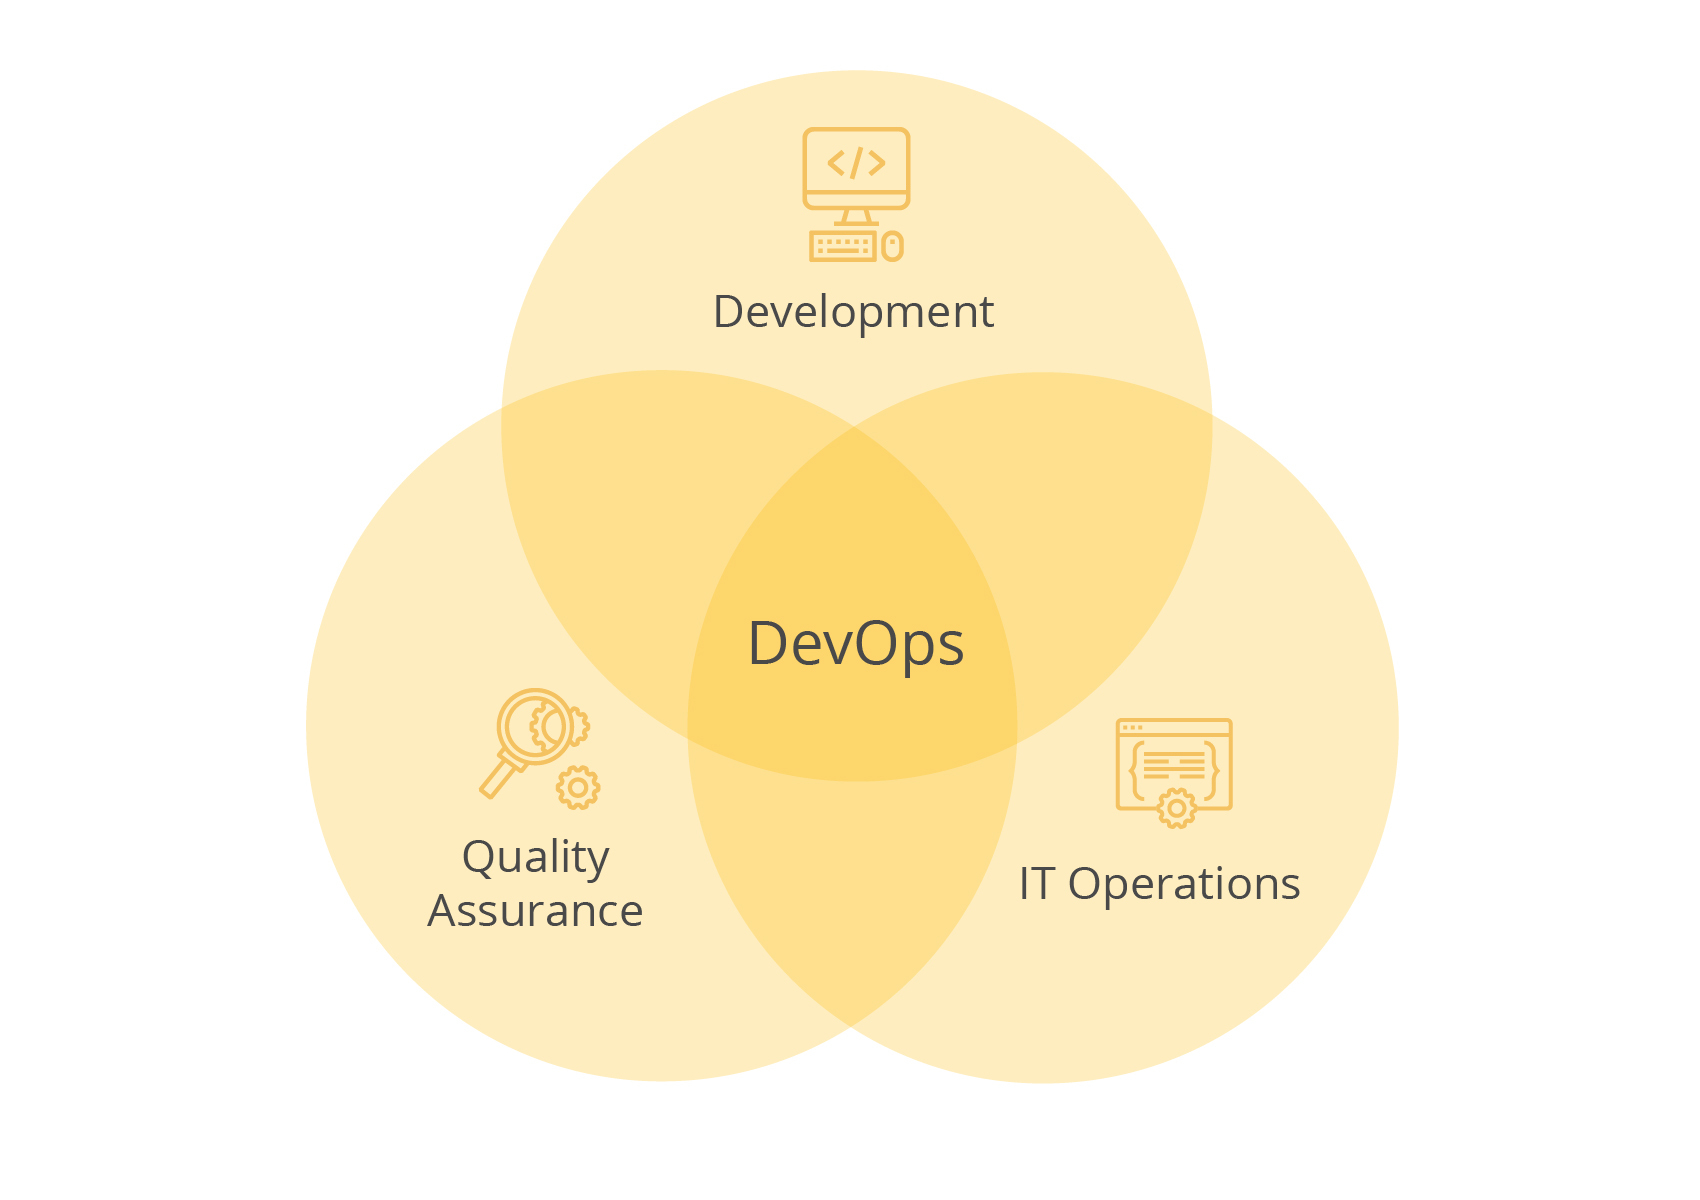 devops roles and responsibilities